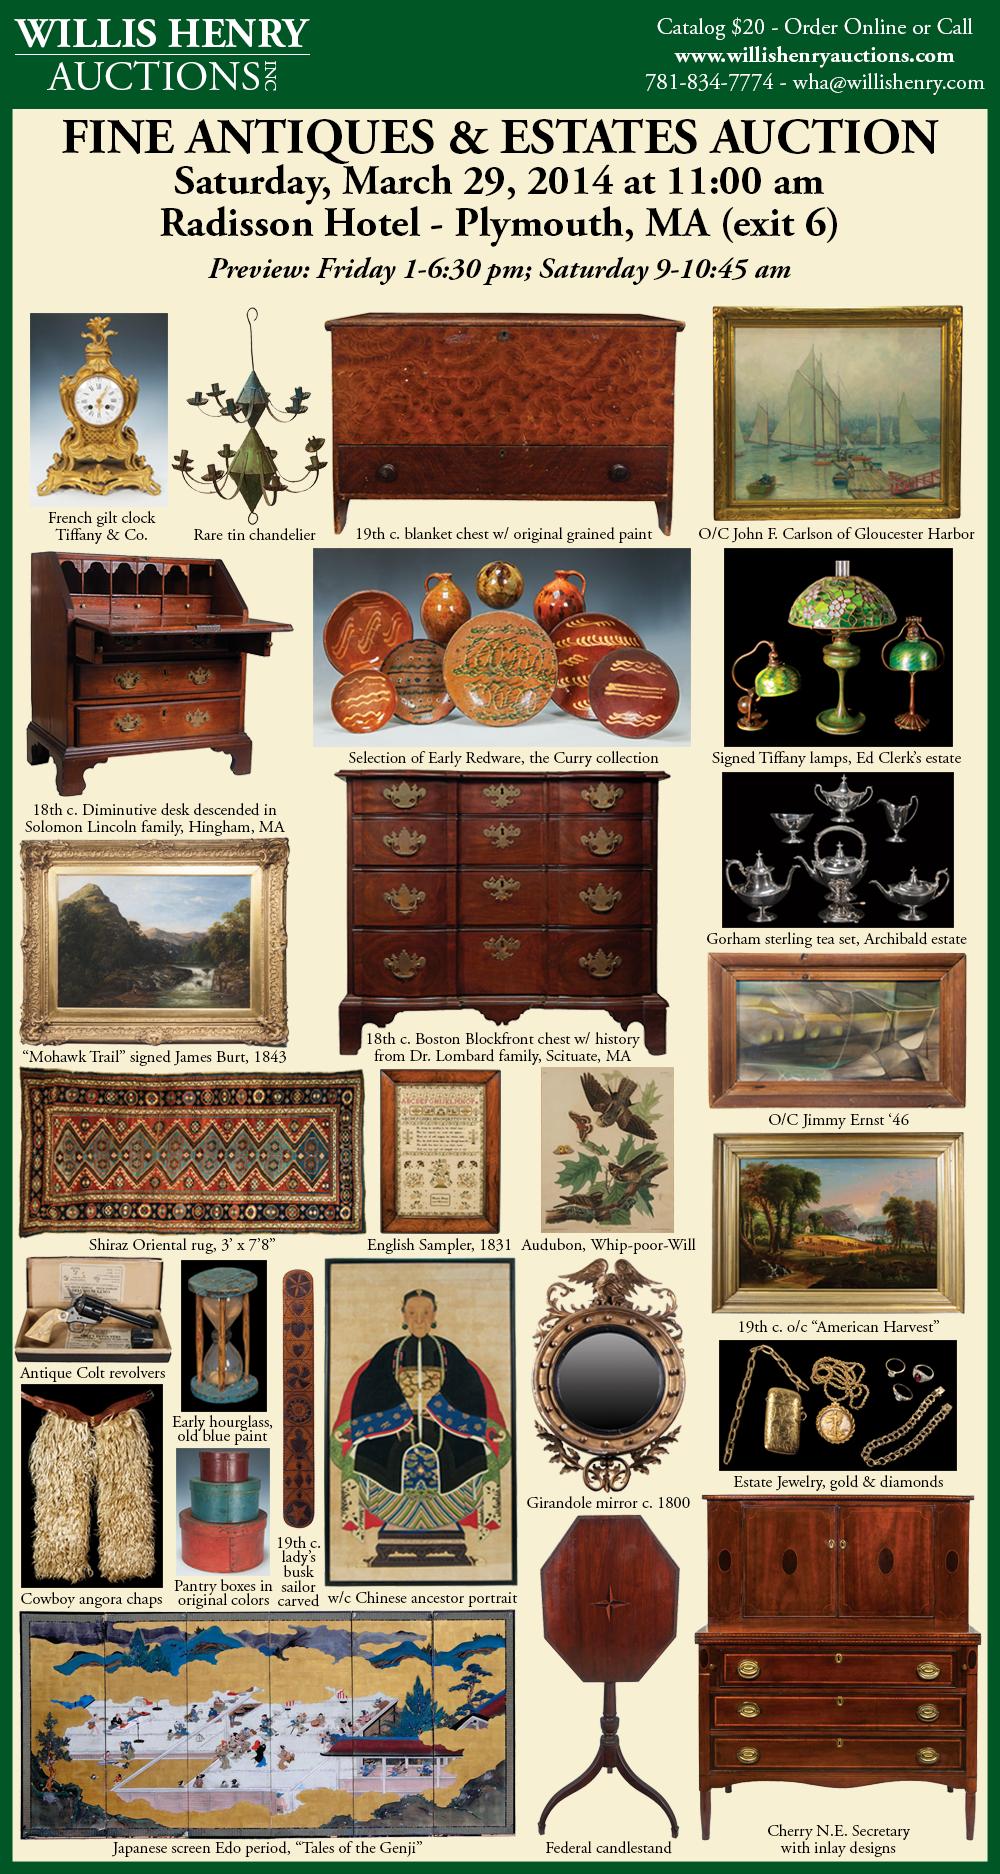 Willis Henry Auctions Inc